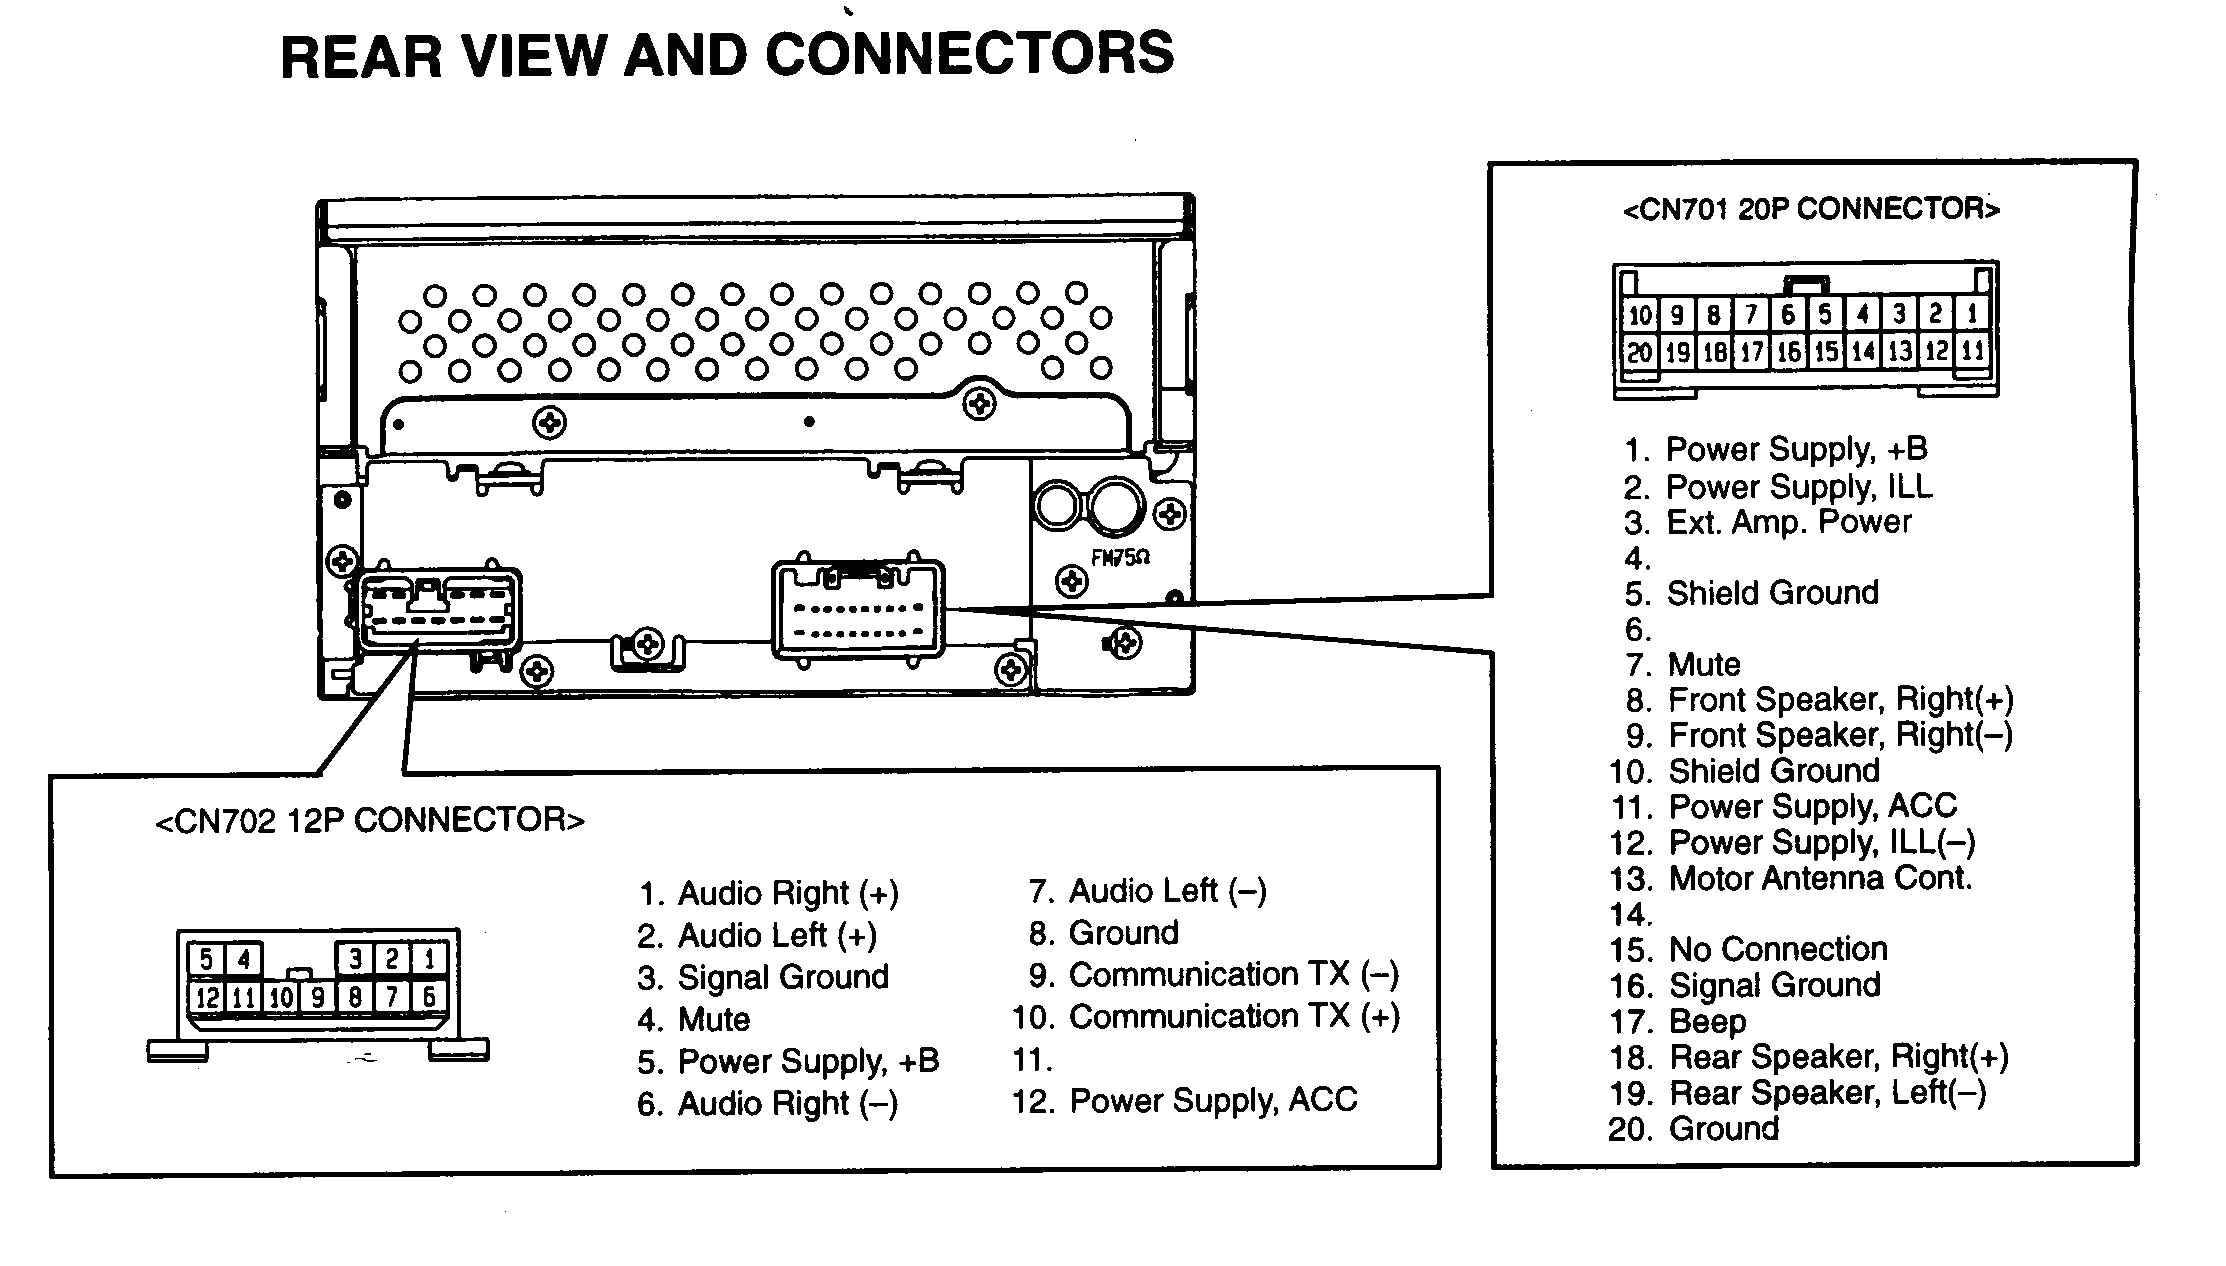 toyota 37204 wiring diagram wiring diagram featured 1 8 stereo wiring diagram wiring diagram toyota 37204